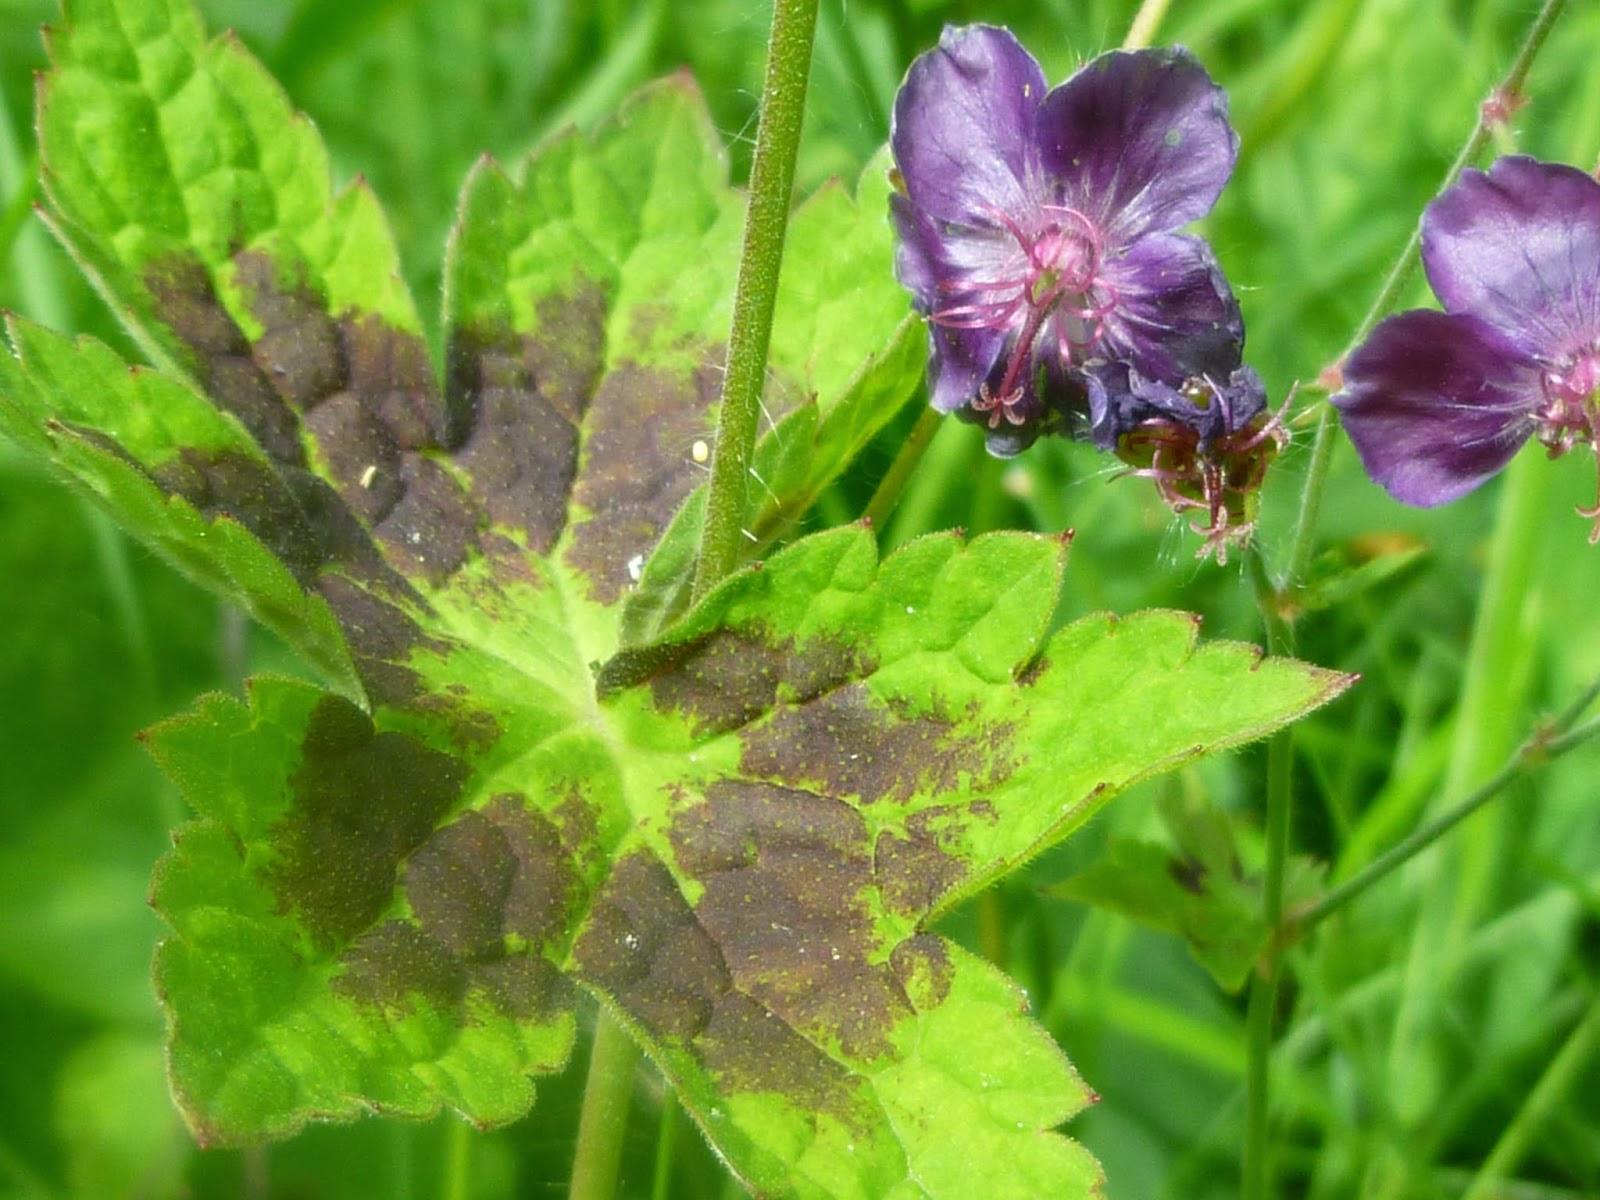 Svanå trädgård: brunnäva